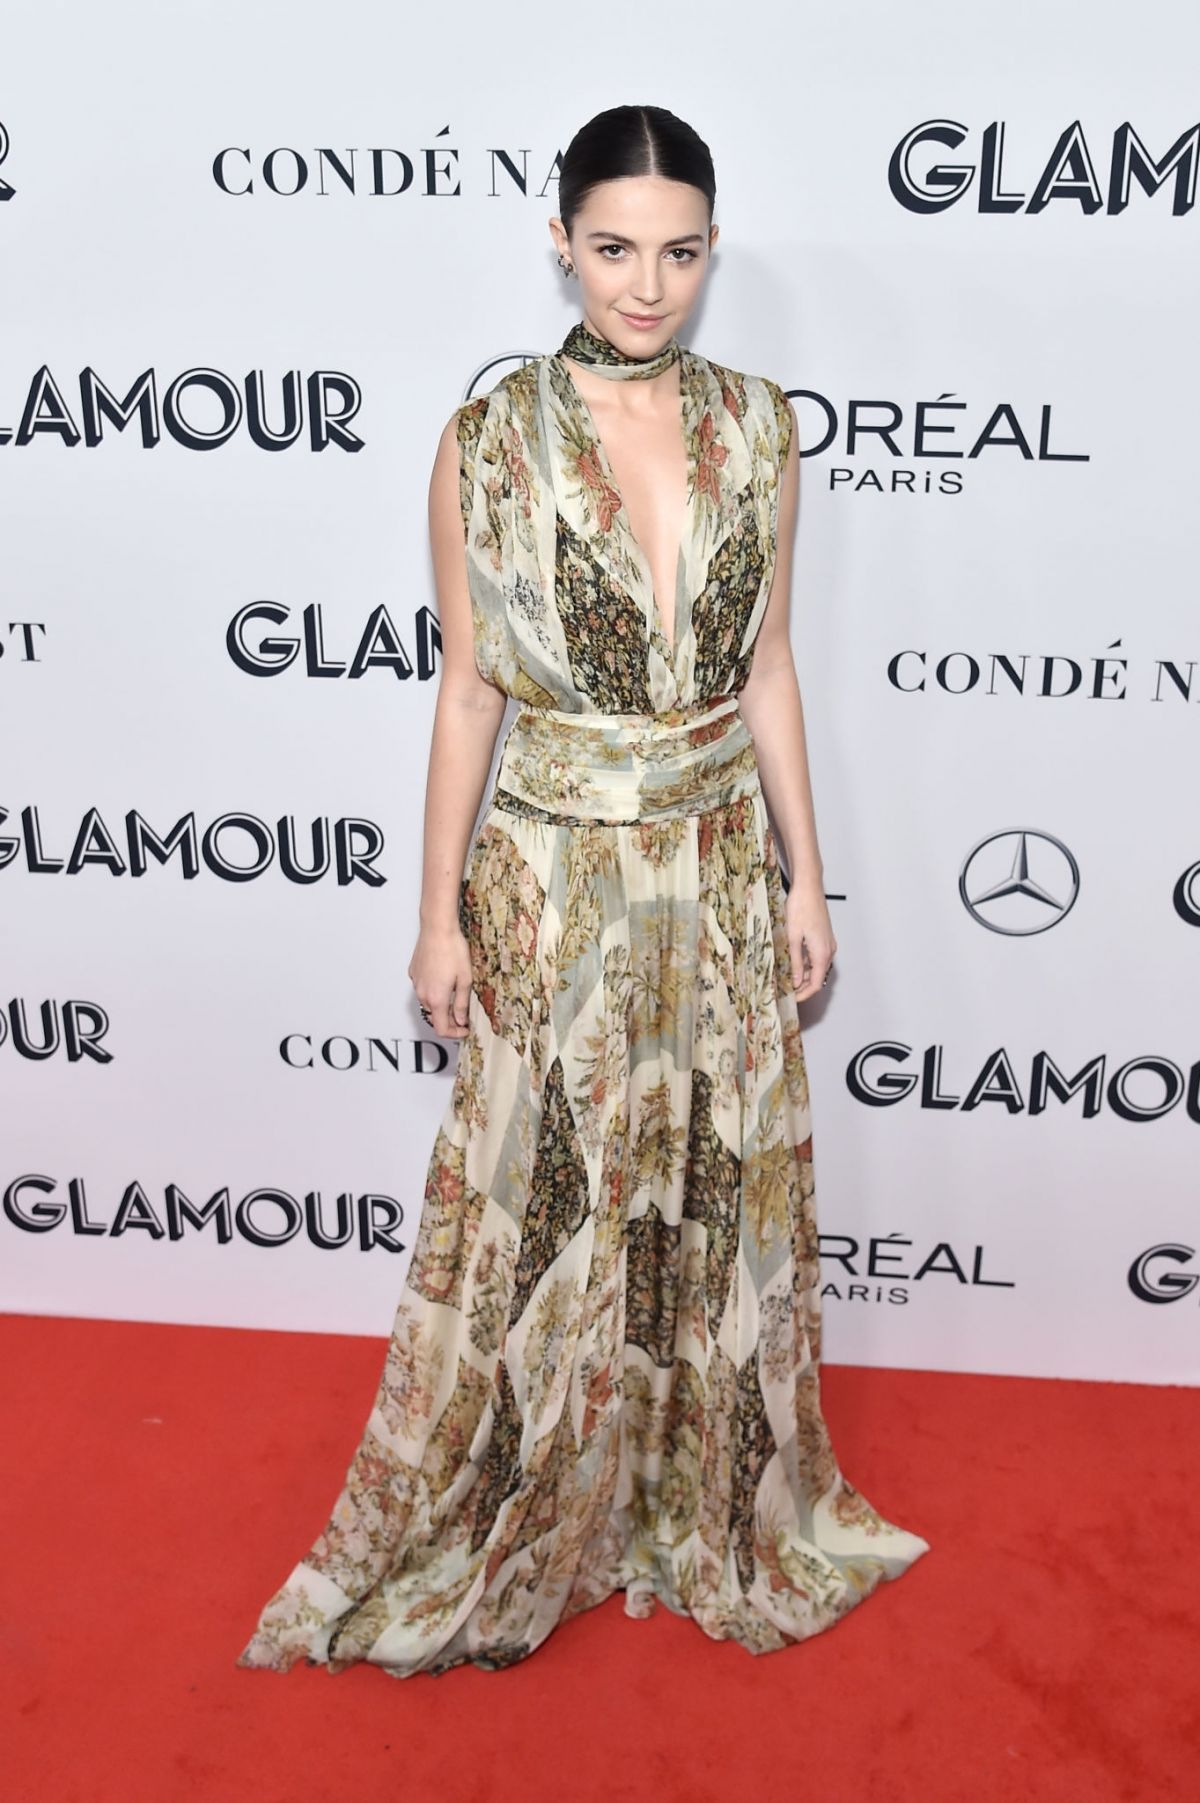 ella-hunt-in-oscar-de-la-renta-2019-glamour-women-of-the-year-awards